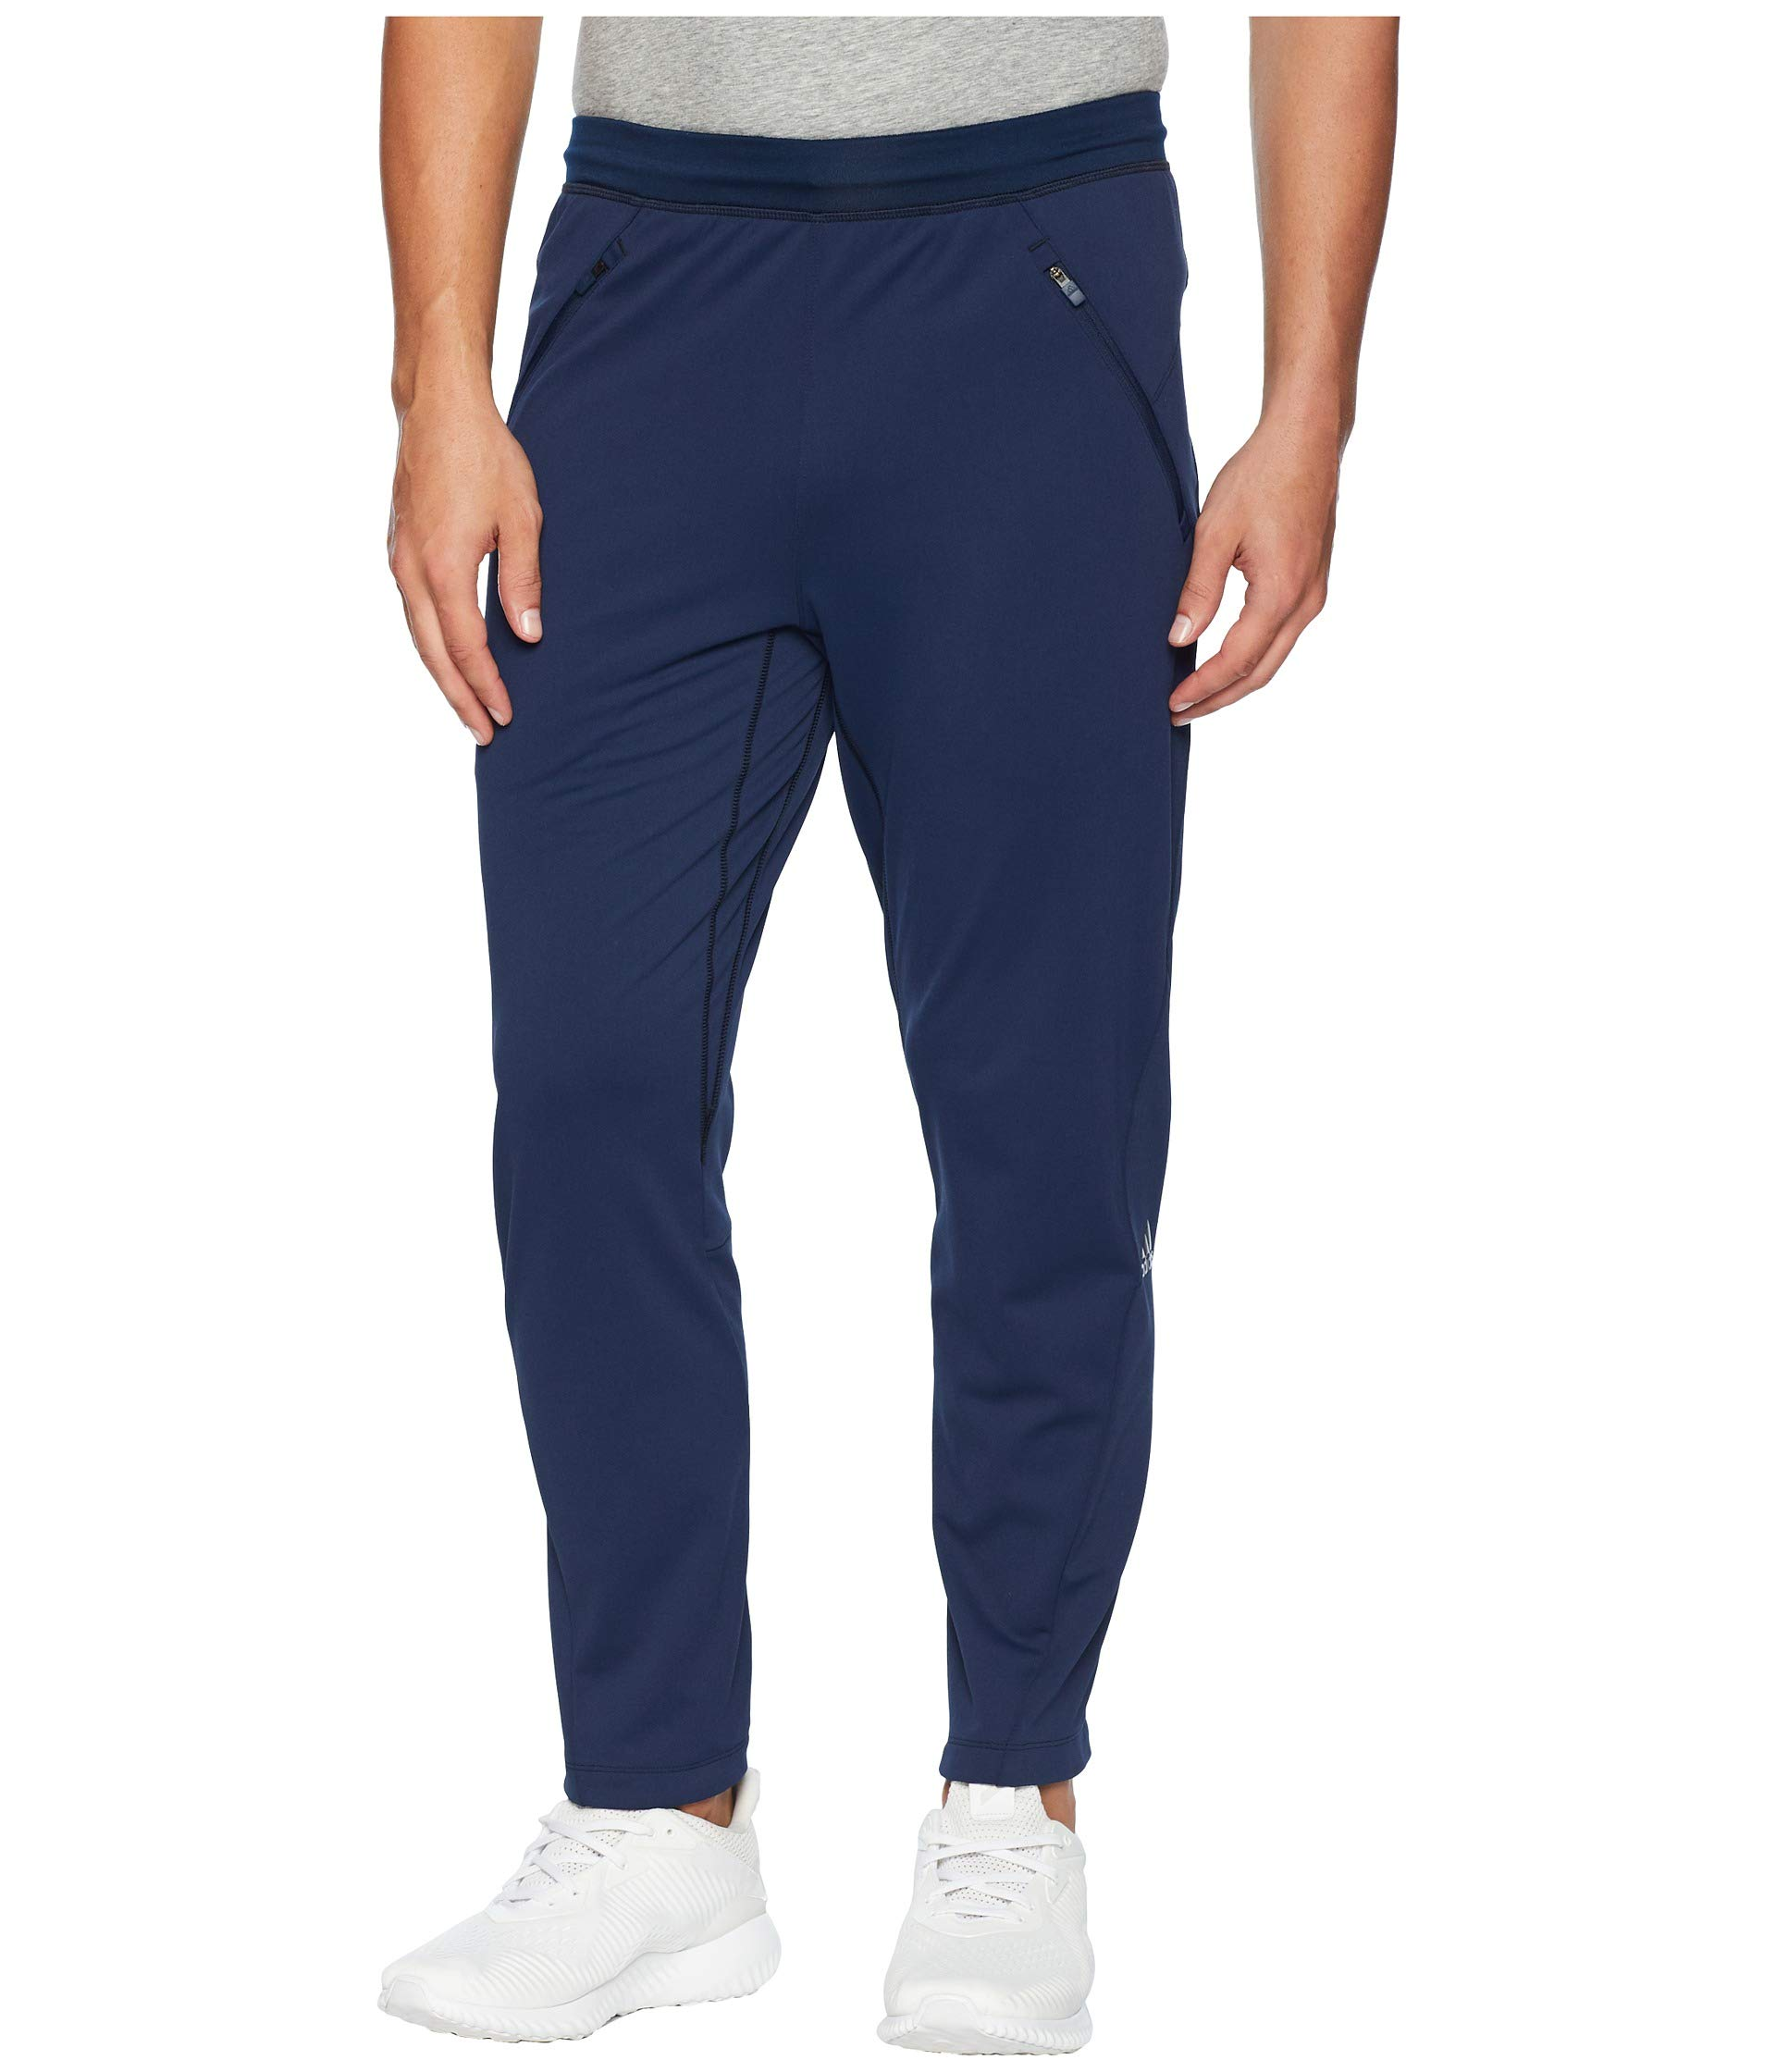 Transitional Adidas Ultimate Collegiate Training Pants Navy wqBR4qC